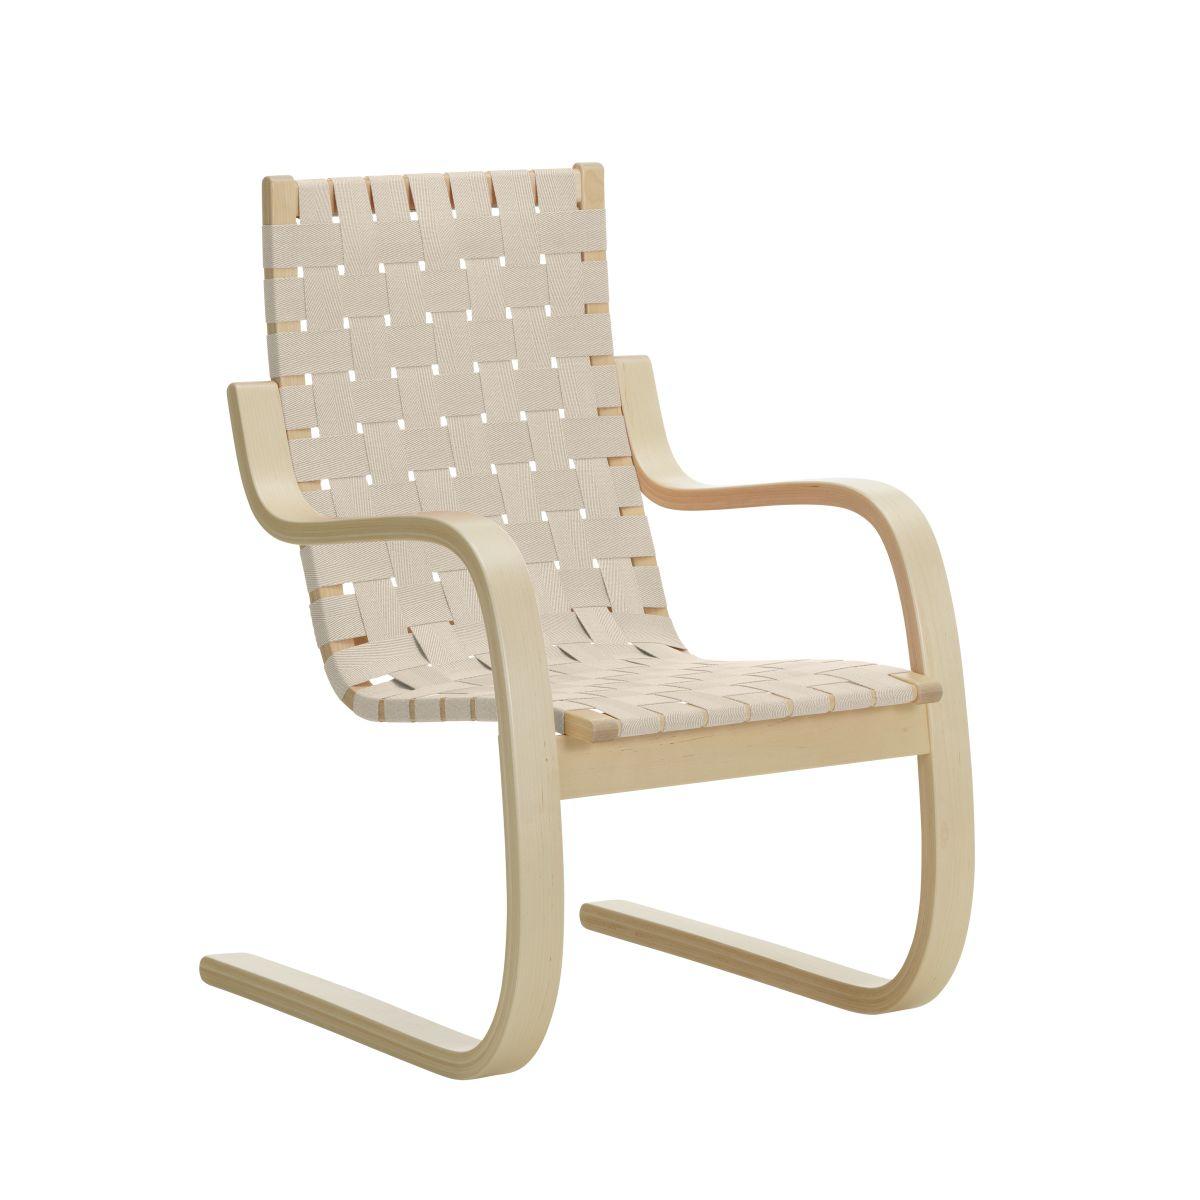 Armchair-406-natural-natural-white-webbing_F-2897117